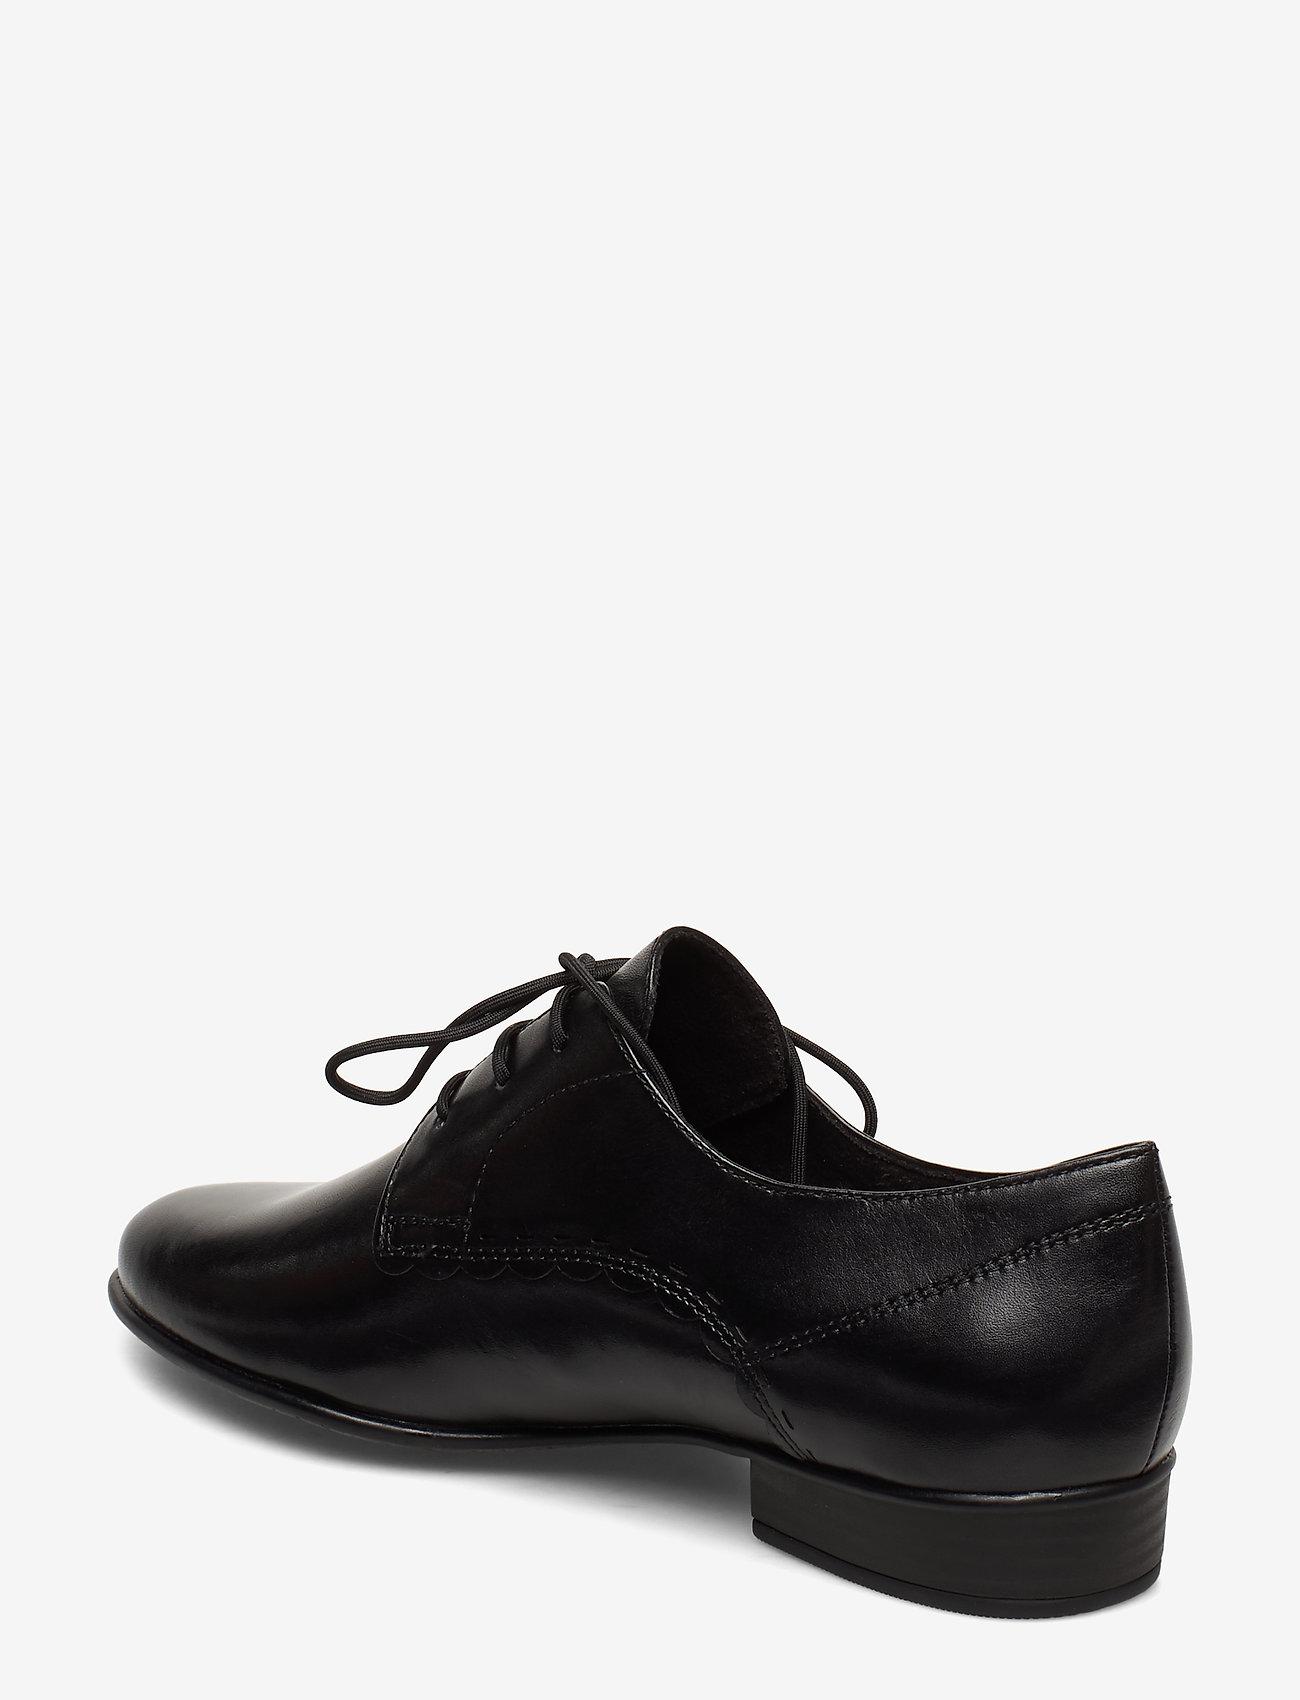 Woms Lace-up (Black Leather) (419.40 kr) - Tamaris